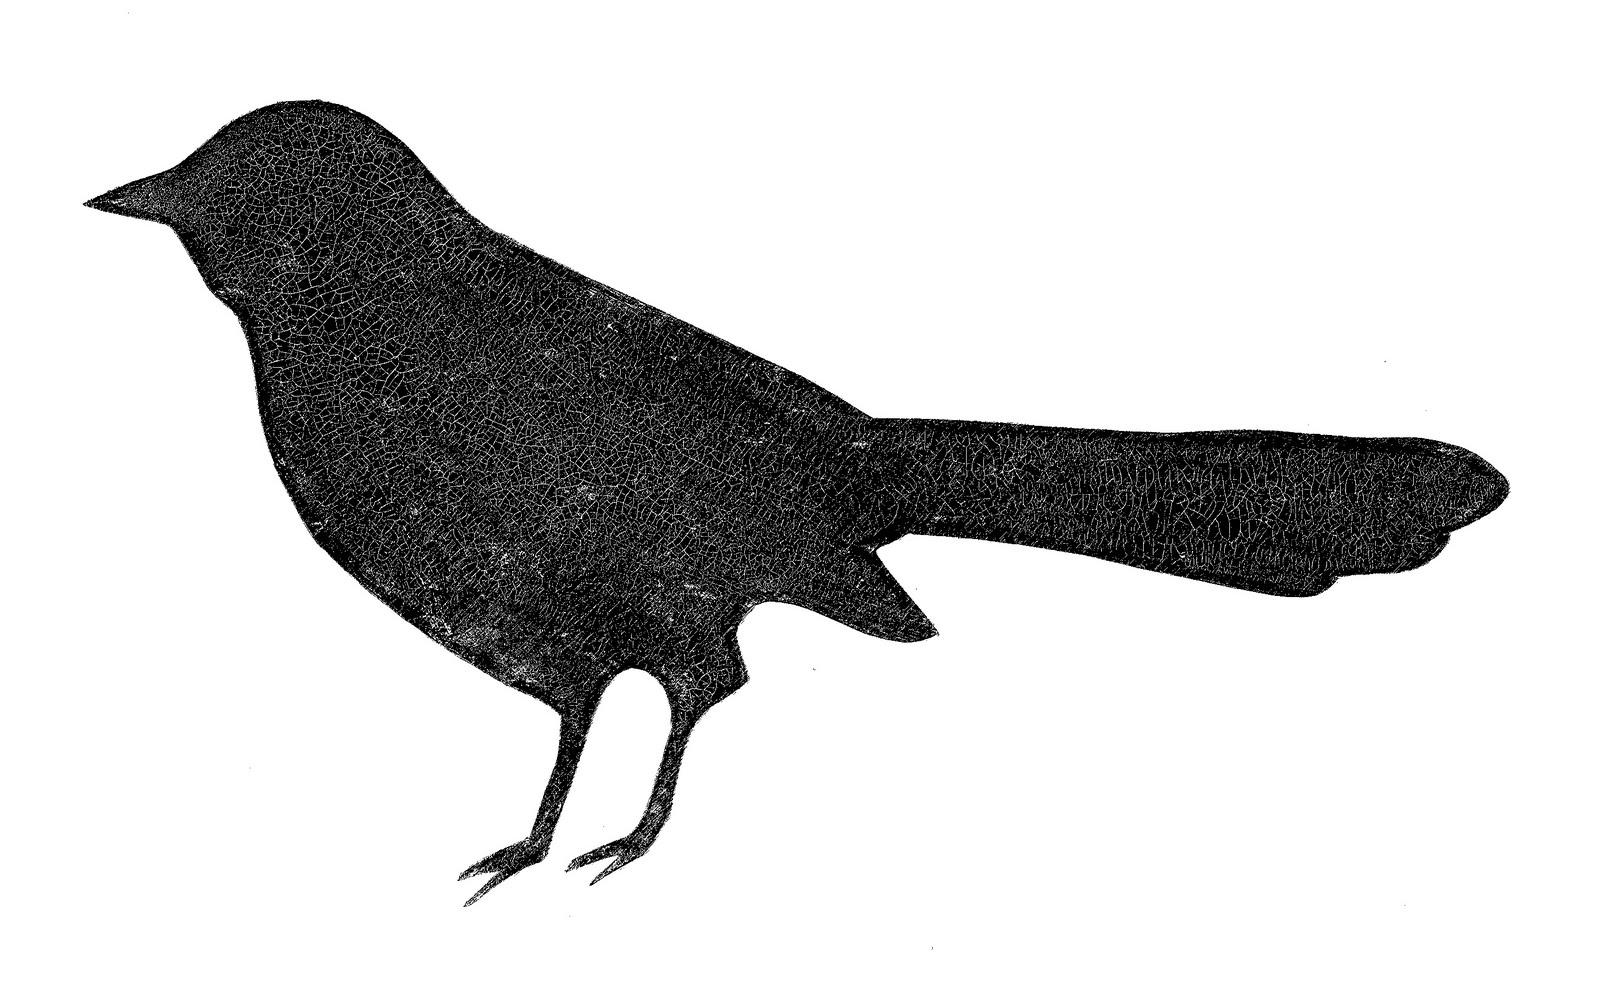 1600x993 Bird Silhouette Clip Art Clipart Image